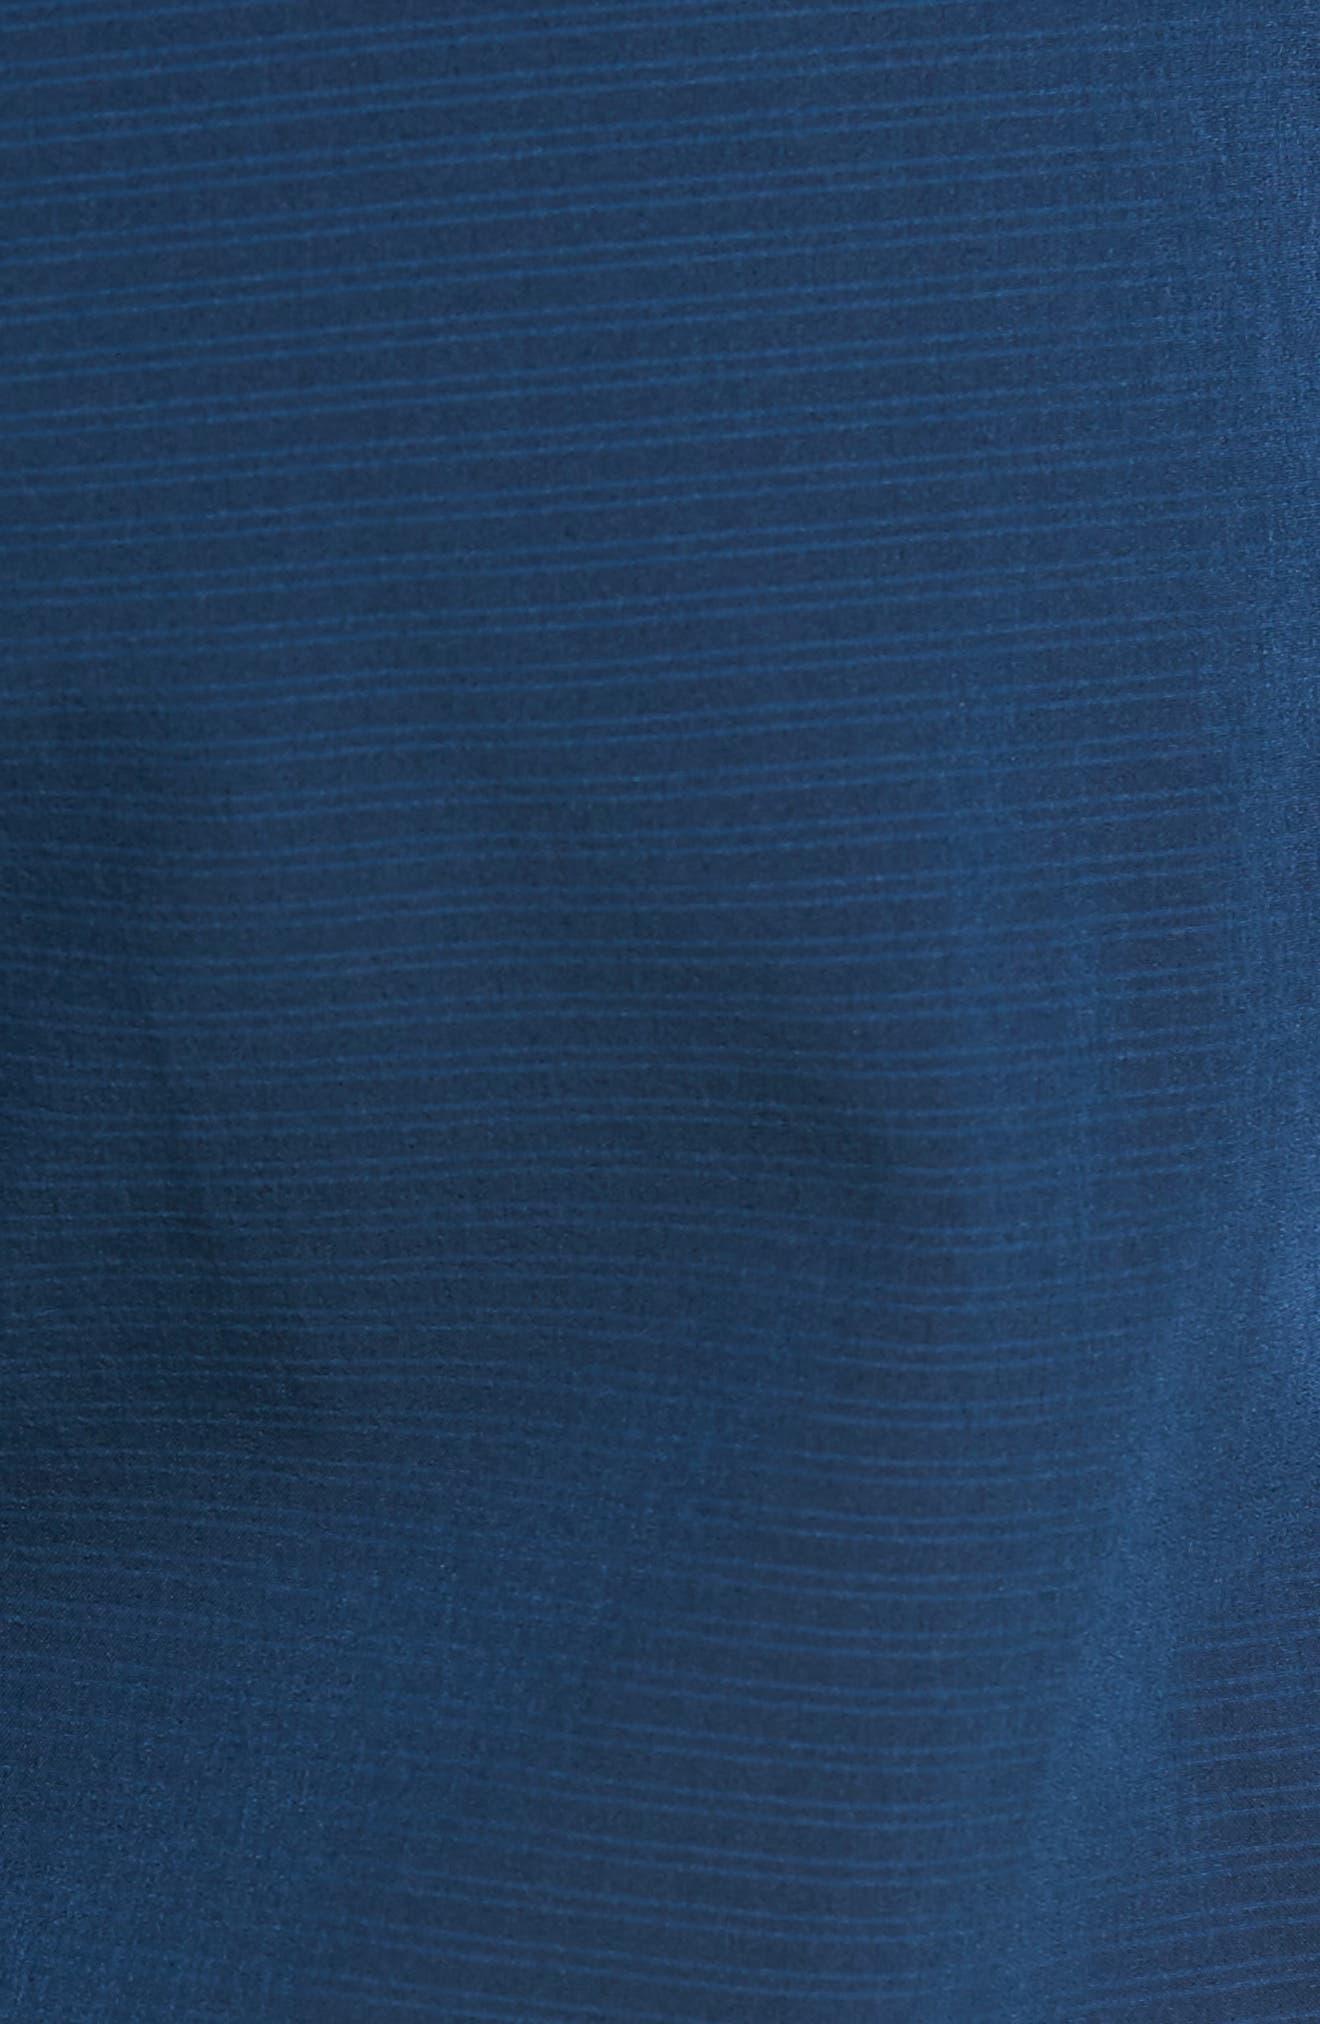 73 X Short Board Shorts,                             Alternate thumbnail 5, color,                             NAVY